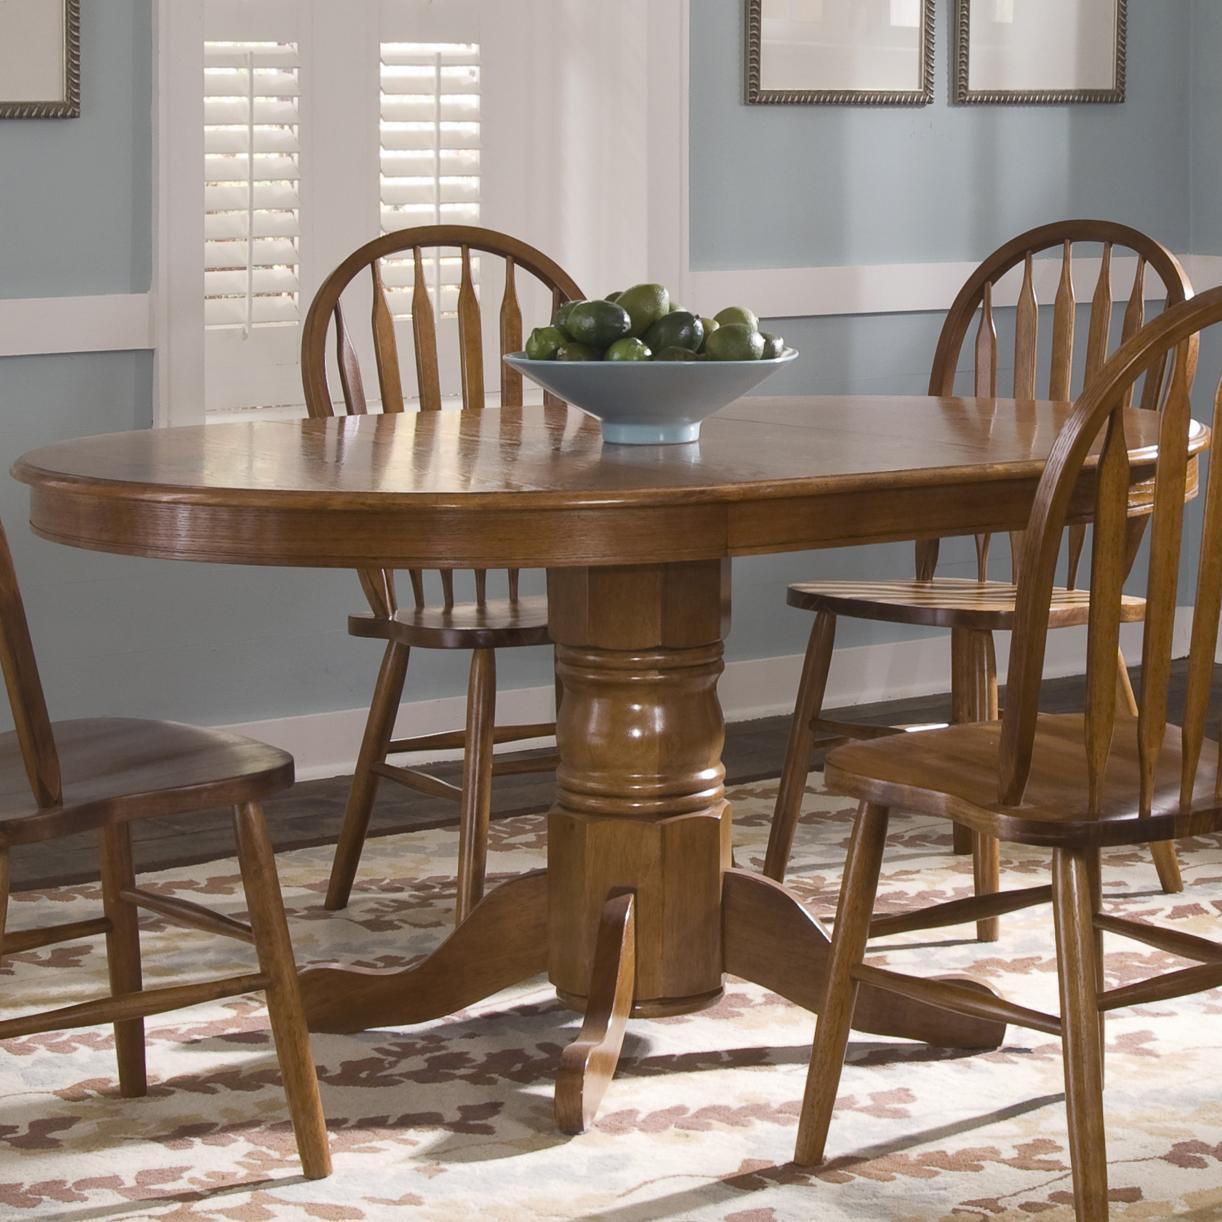 Nostalgia  Pedestal Table by Liberty Furniture at Lapeer Furniture & Mattress Center